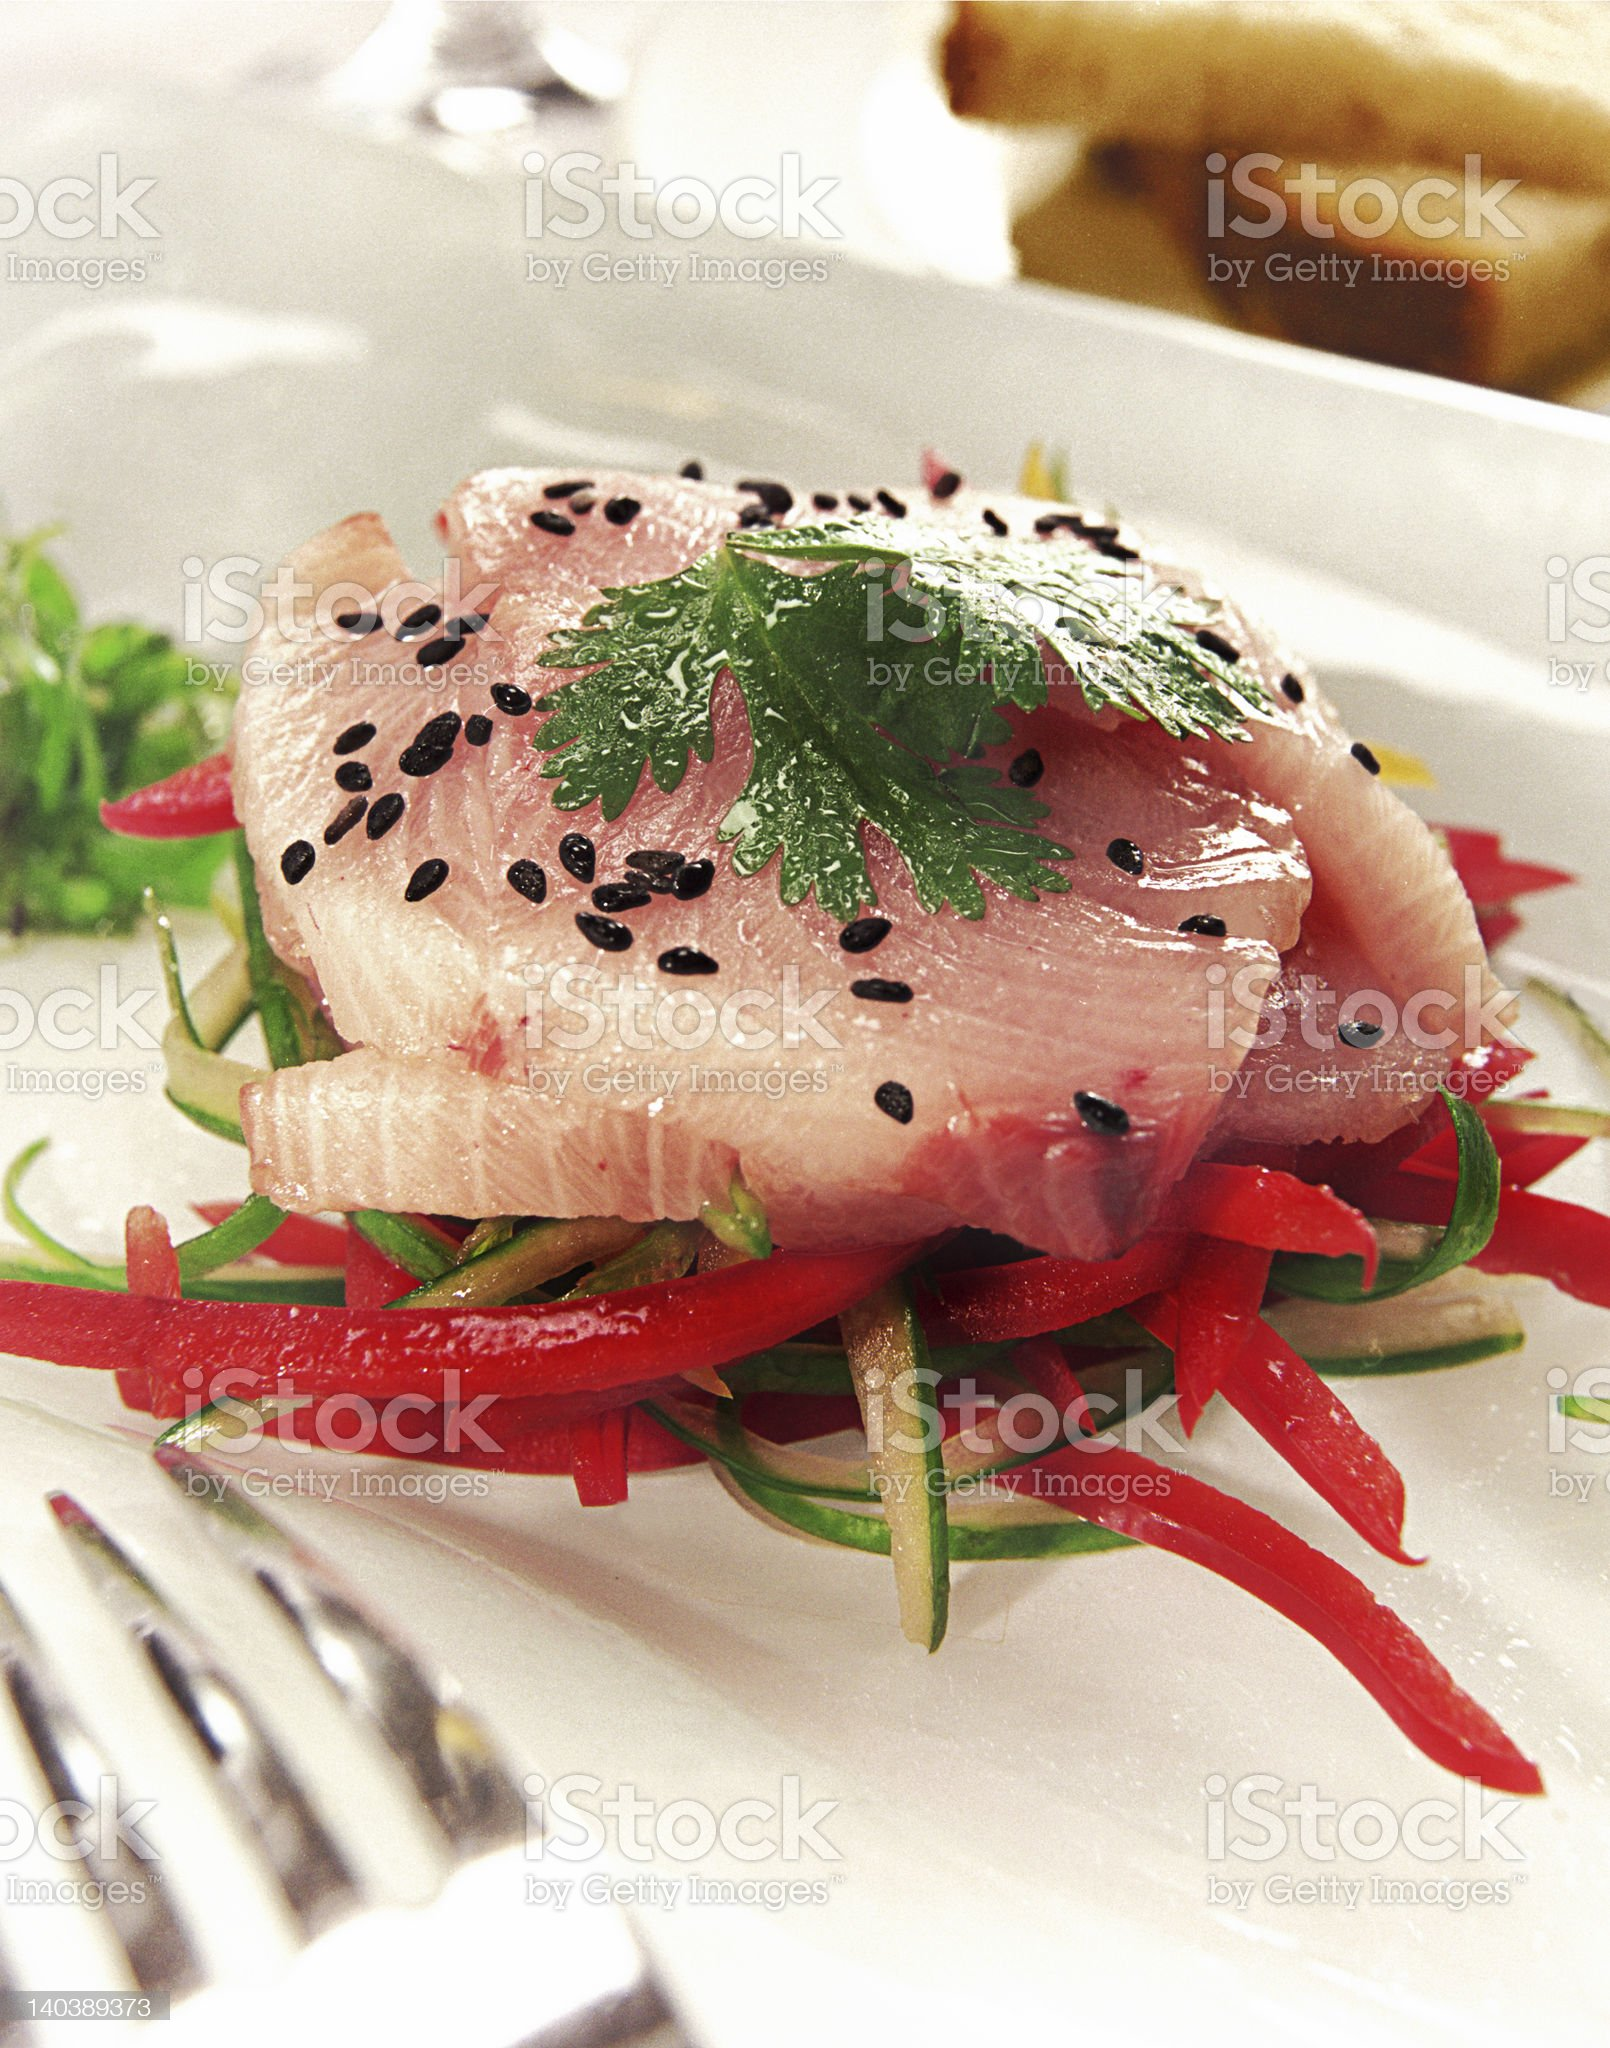 Tuna Appetizer royalty-free stock photo